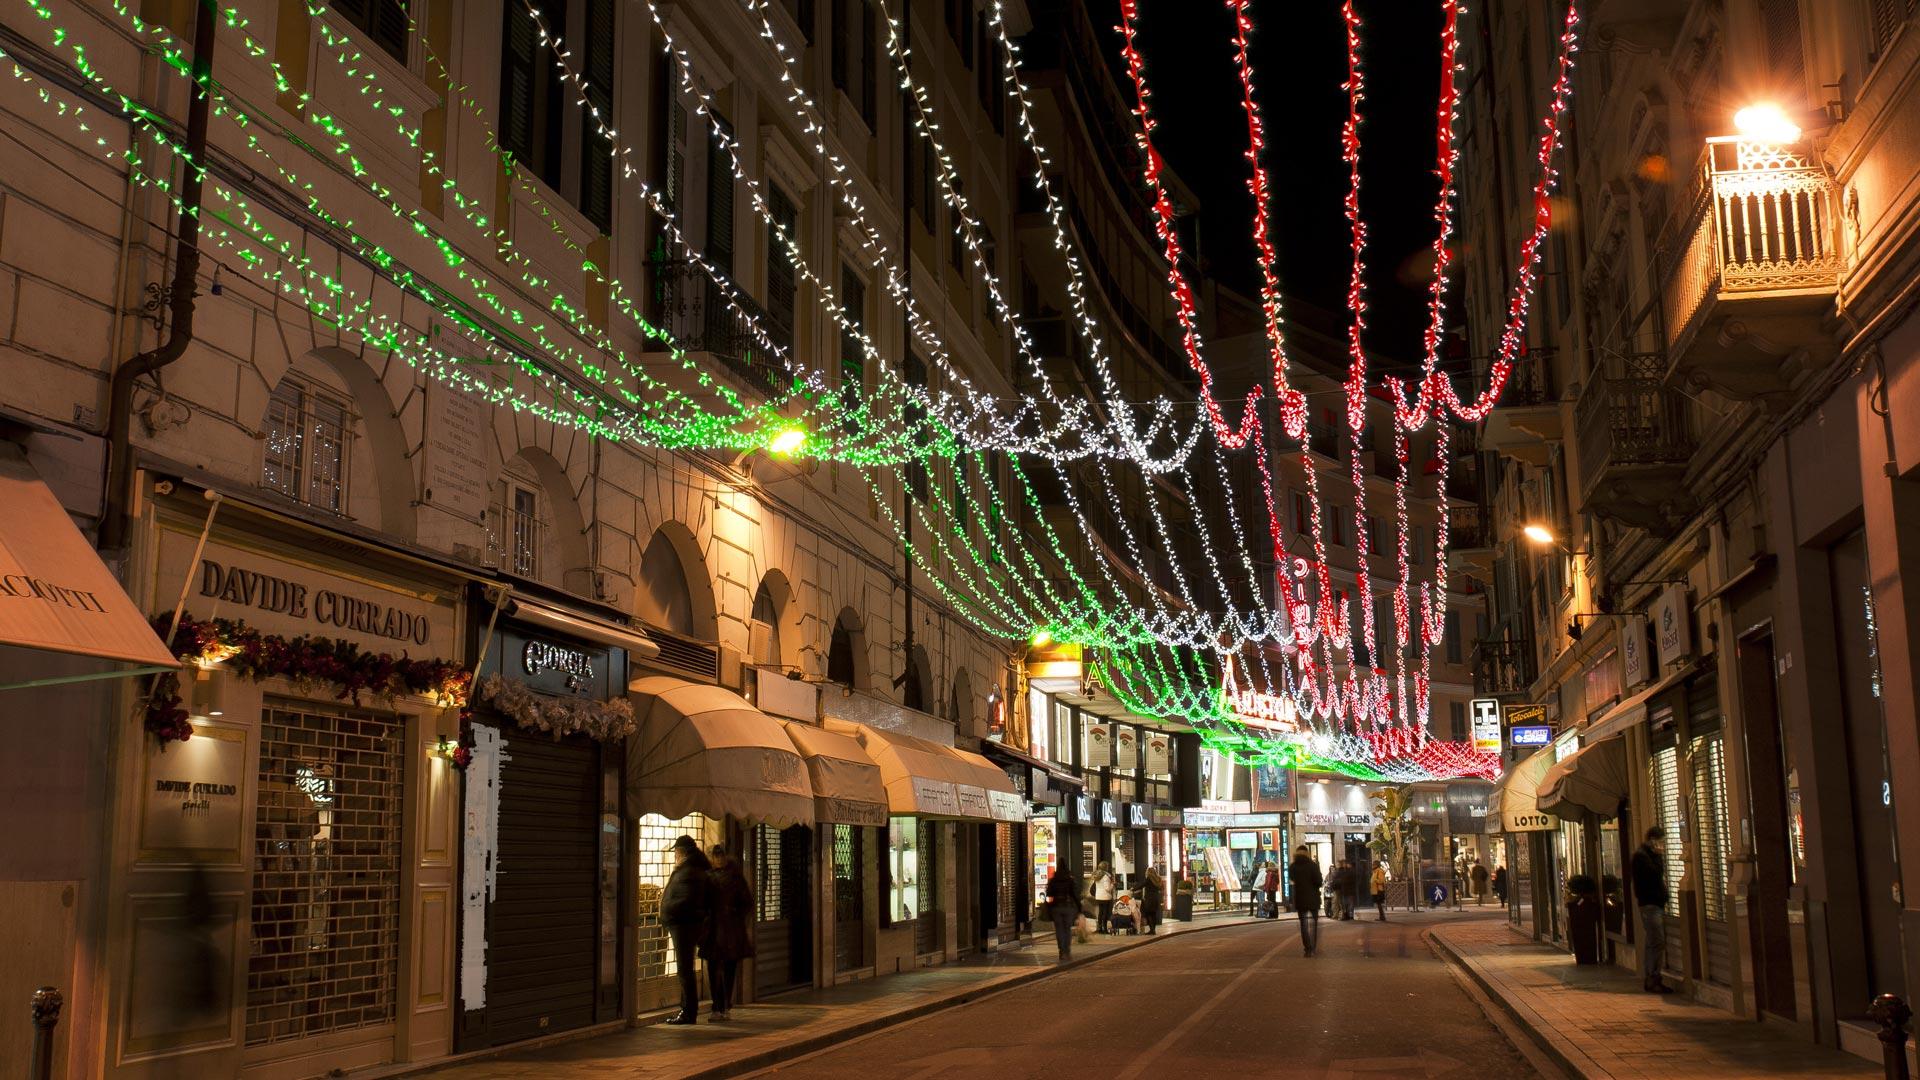 Tetto Italia led luminarie spazi urbani guagliata Genova